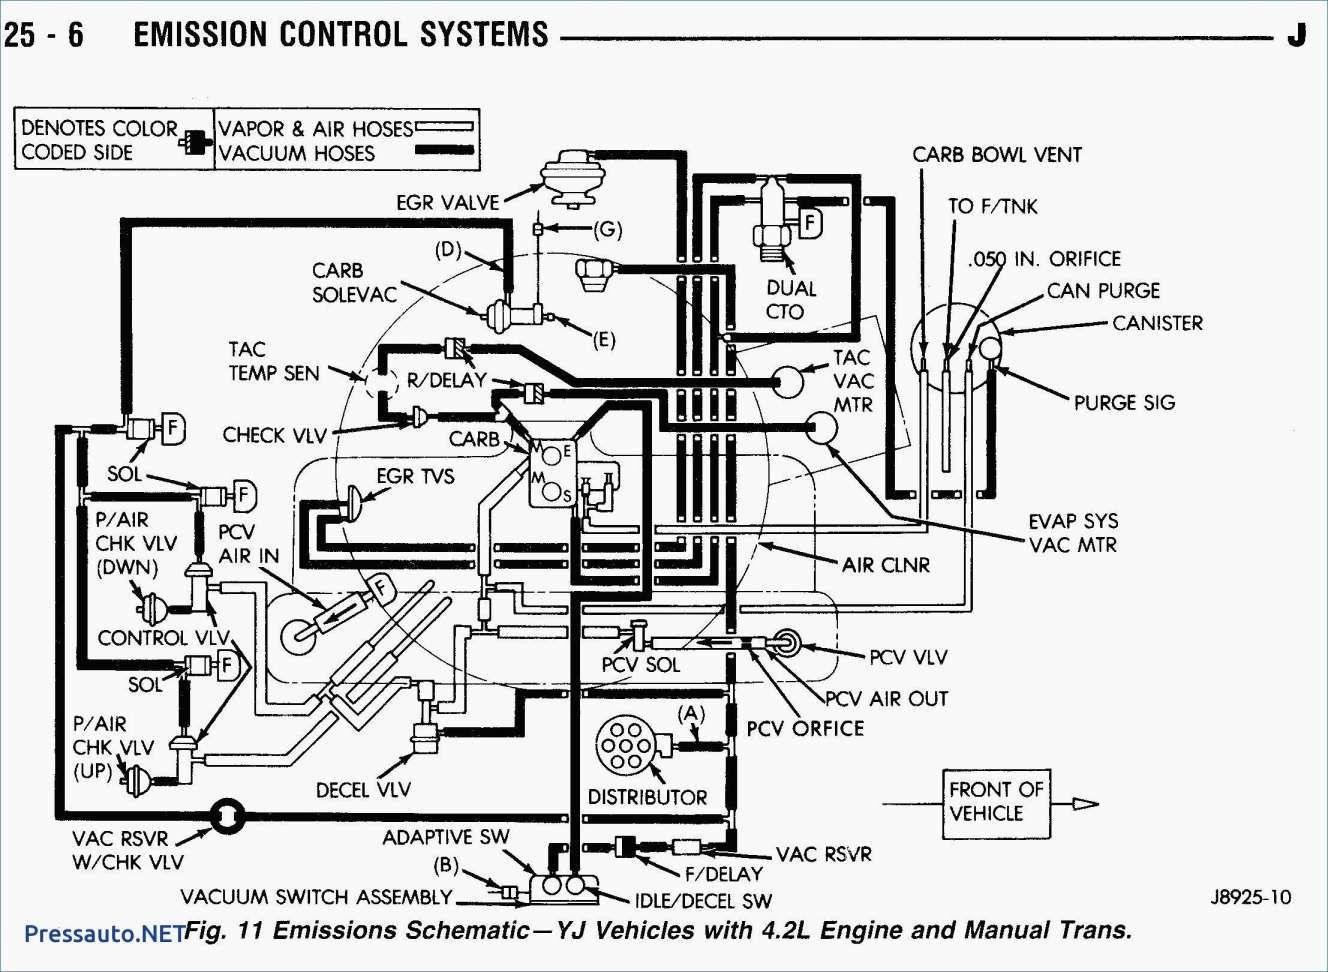 18 1990 Jeep Wrangler Engine Wiring Diagram Engine Diagram Wiringg Net In 2020 Jeep Wrangler Engine Jeep Wrangler Jeep